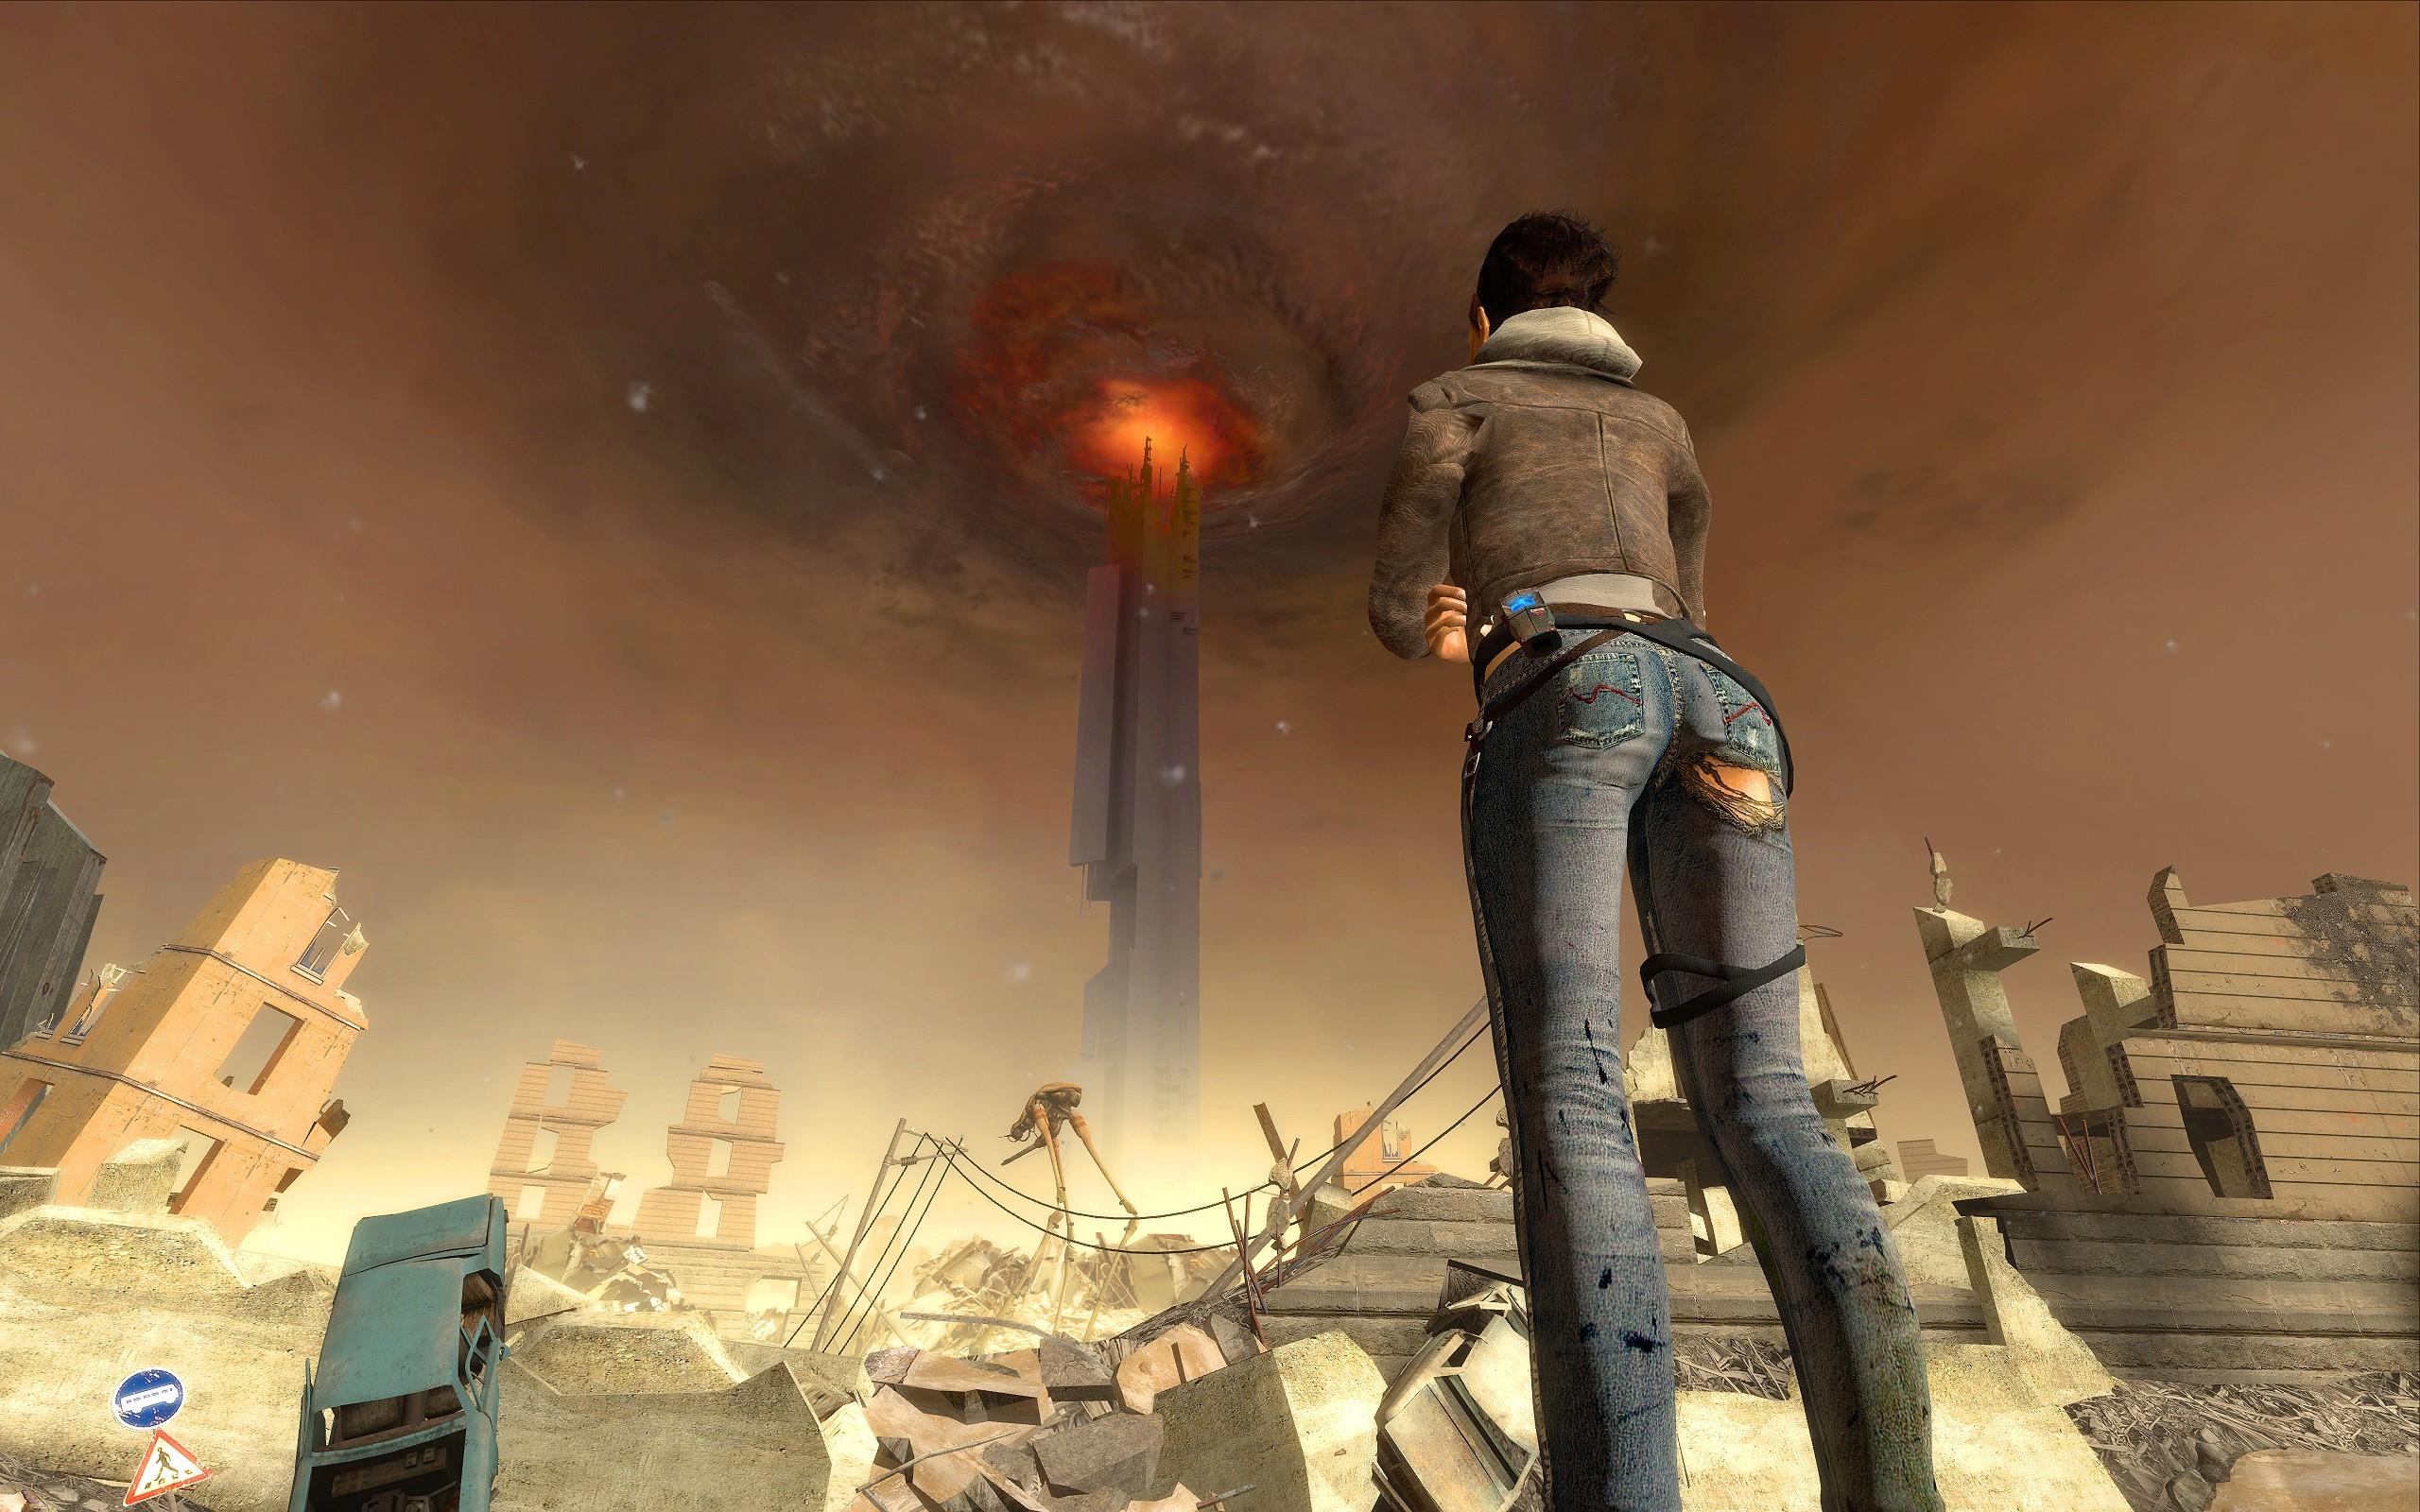 video Games Digital Art Half Life 2 Alyx Vance Wallpapers HD 2560x1600